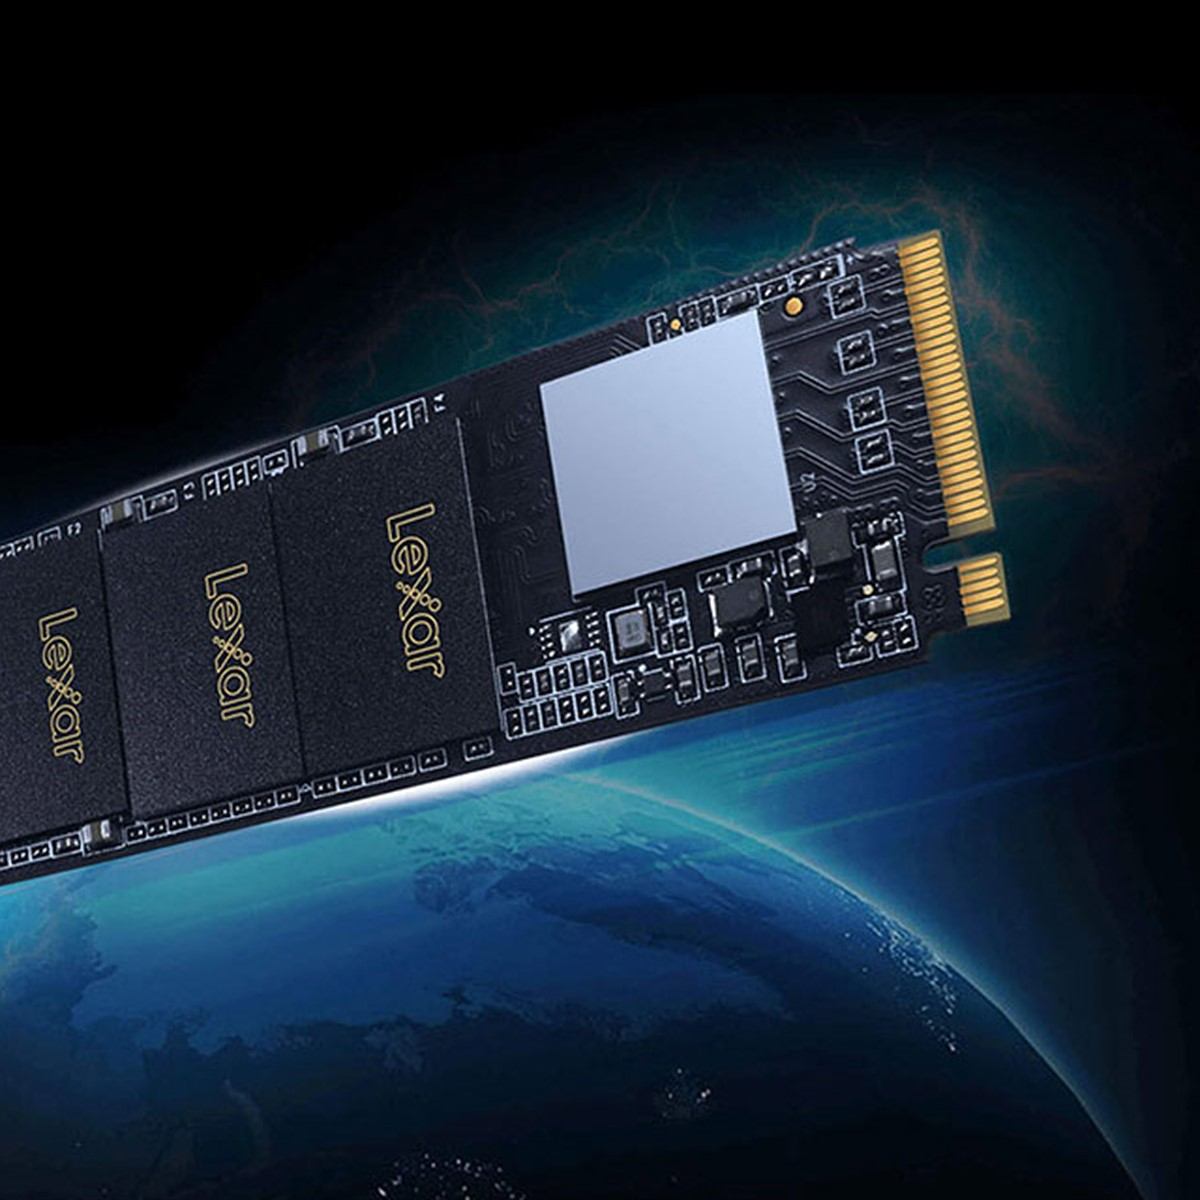 Lexar 512 GB USB 3.0 Pro Workflow Data Storage External SSD Solid State Drive